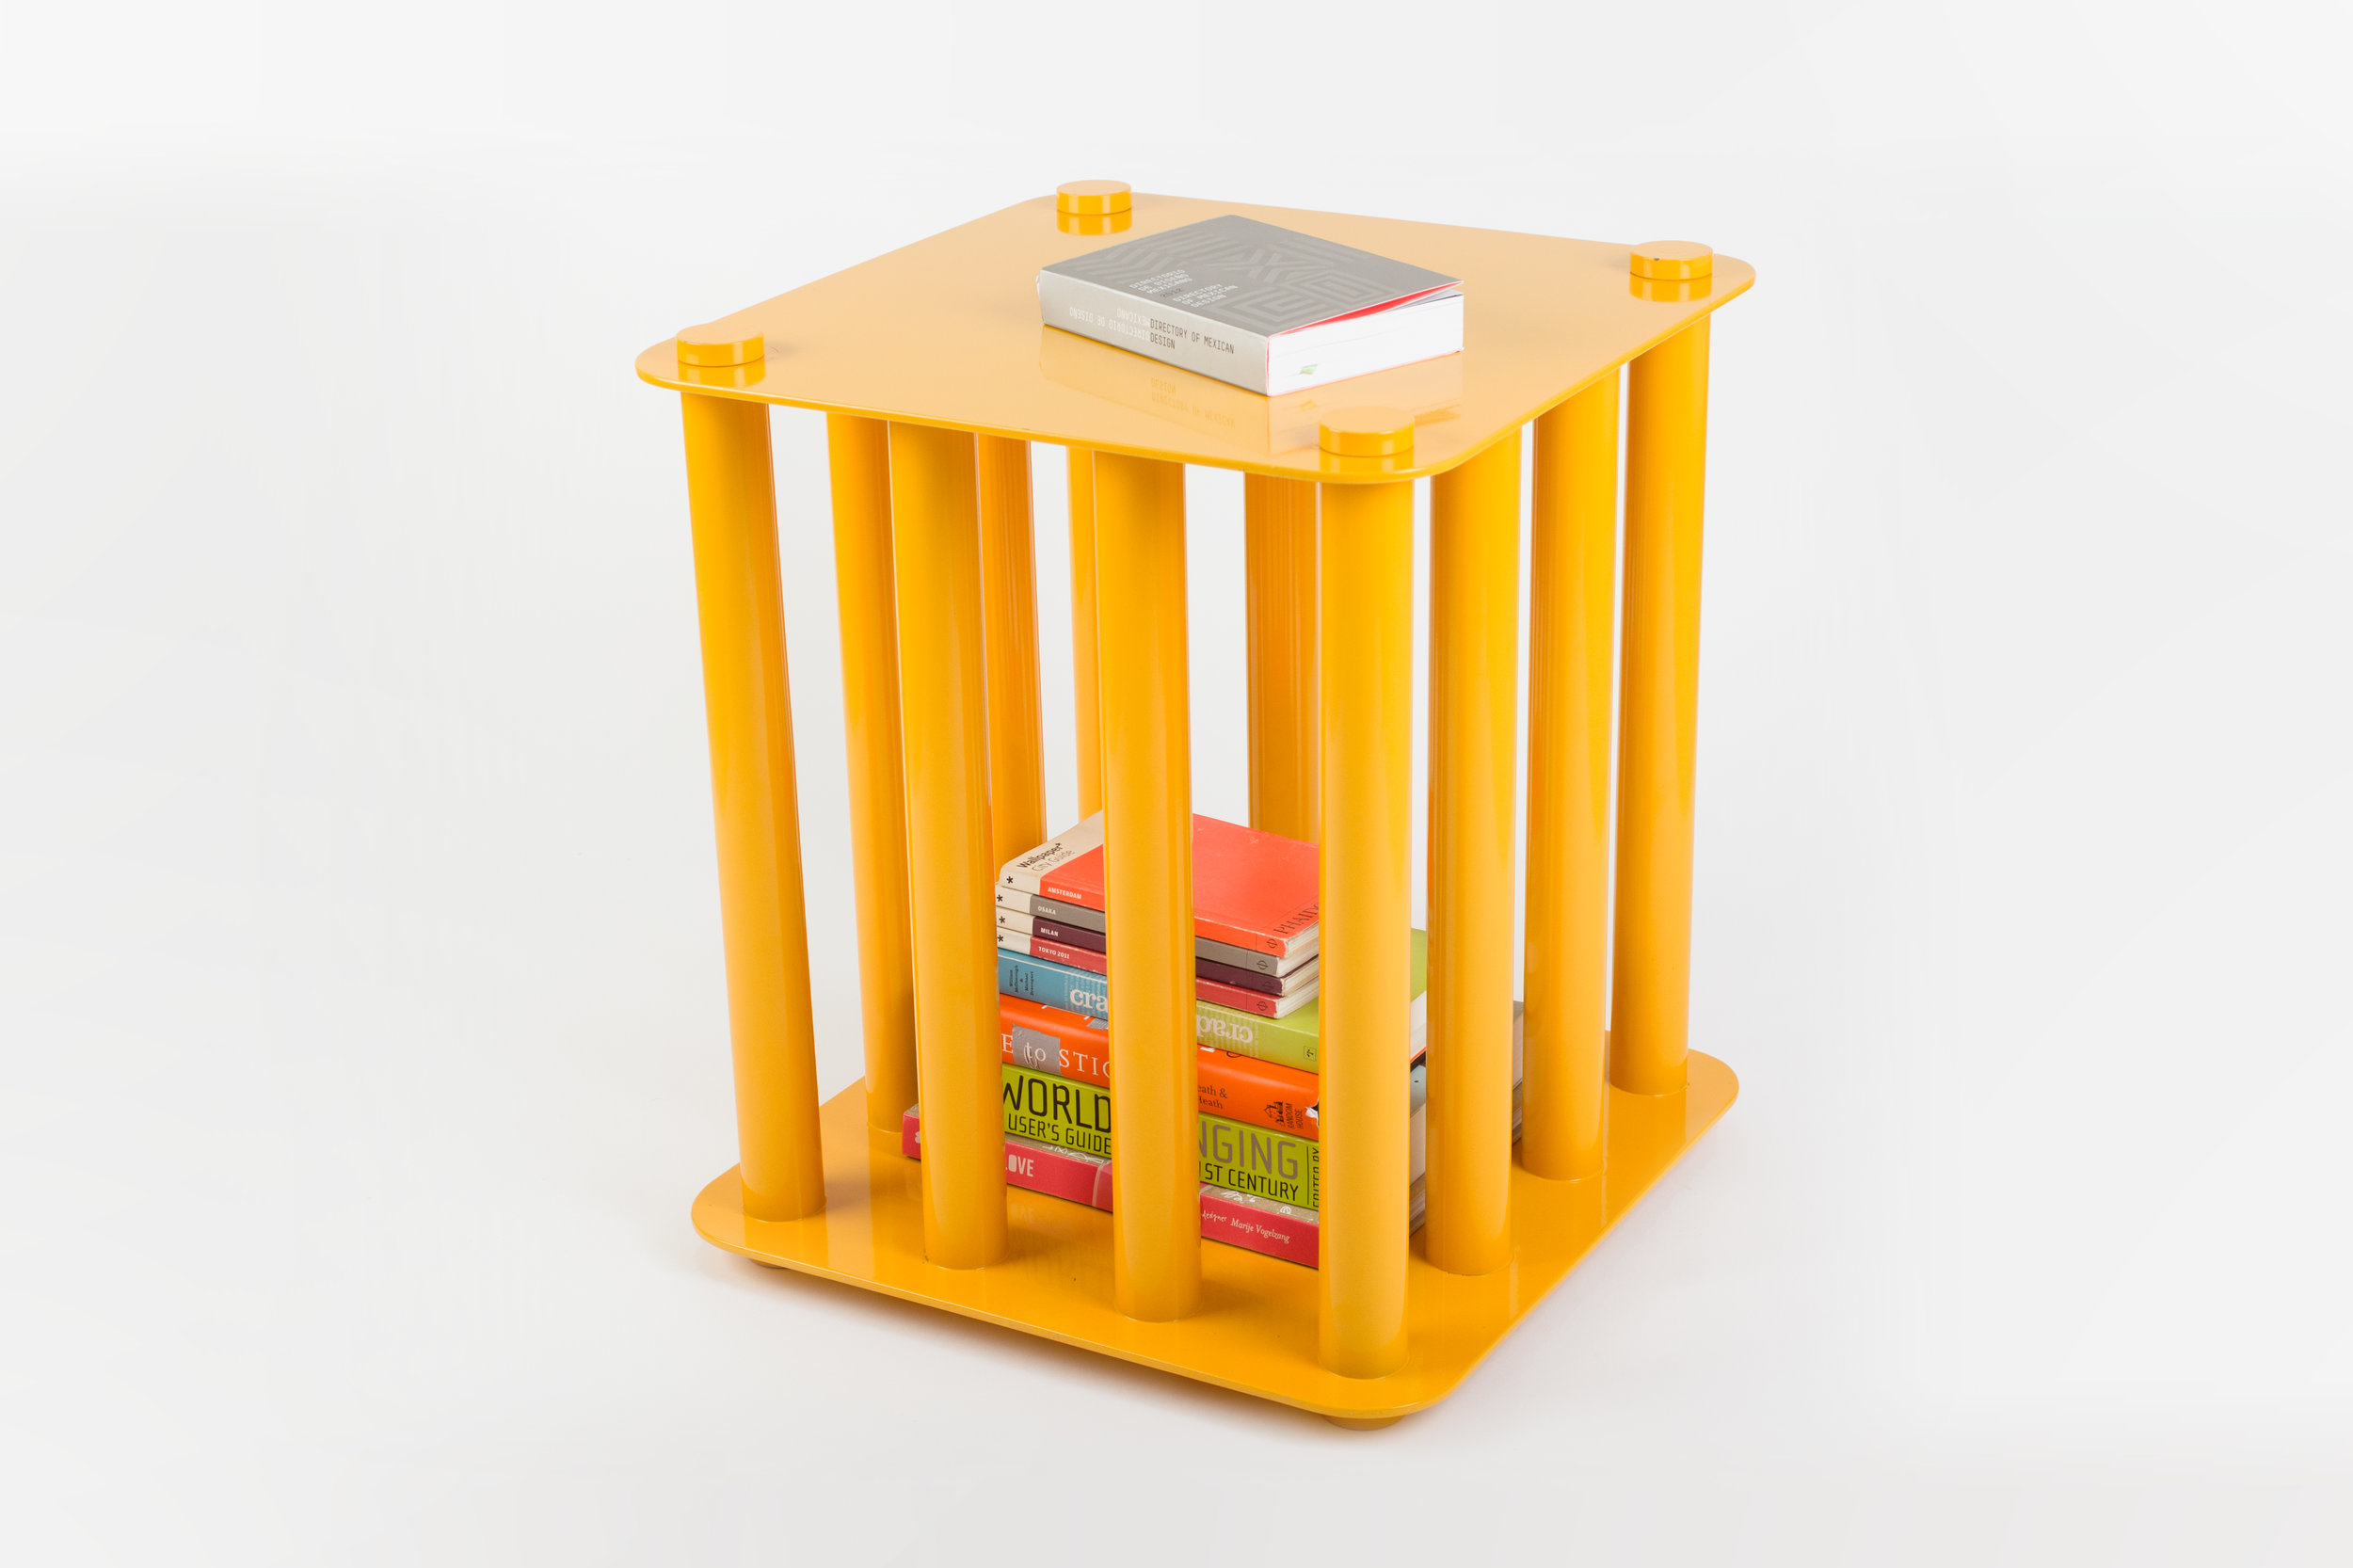 jorge-diego-etienne-cages-12